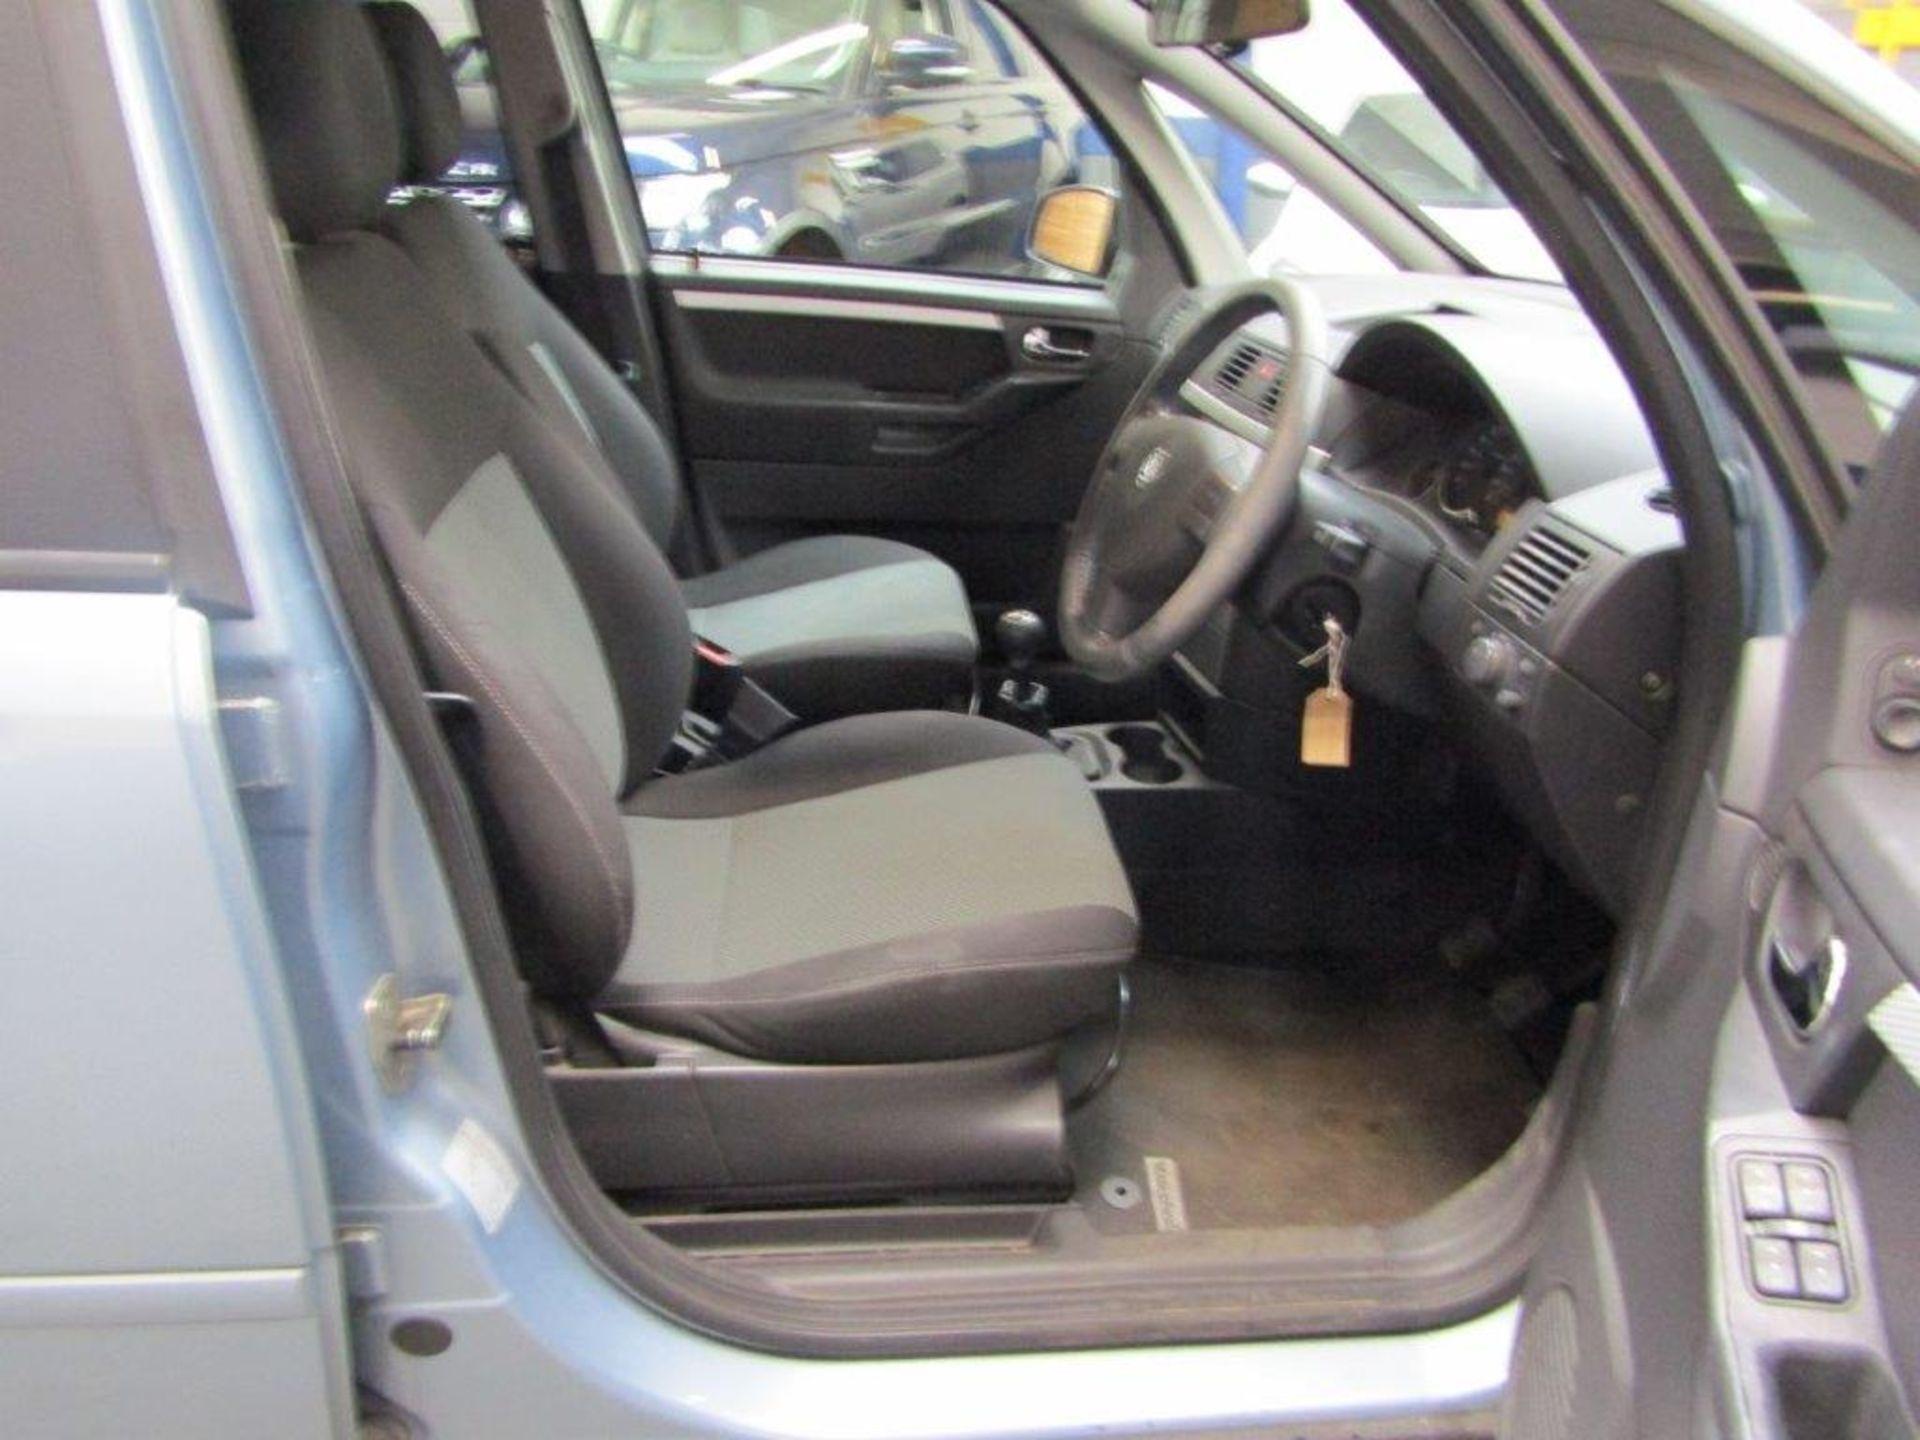 58 08 Vauxhall Meriva Design - Image 6 of 25